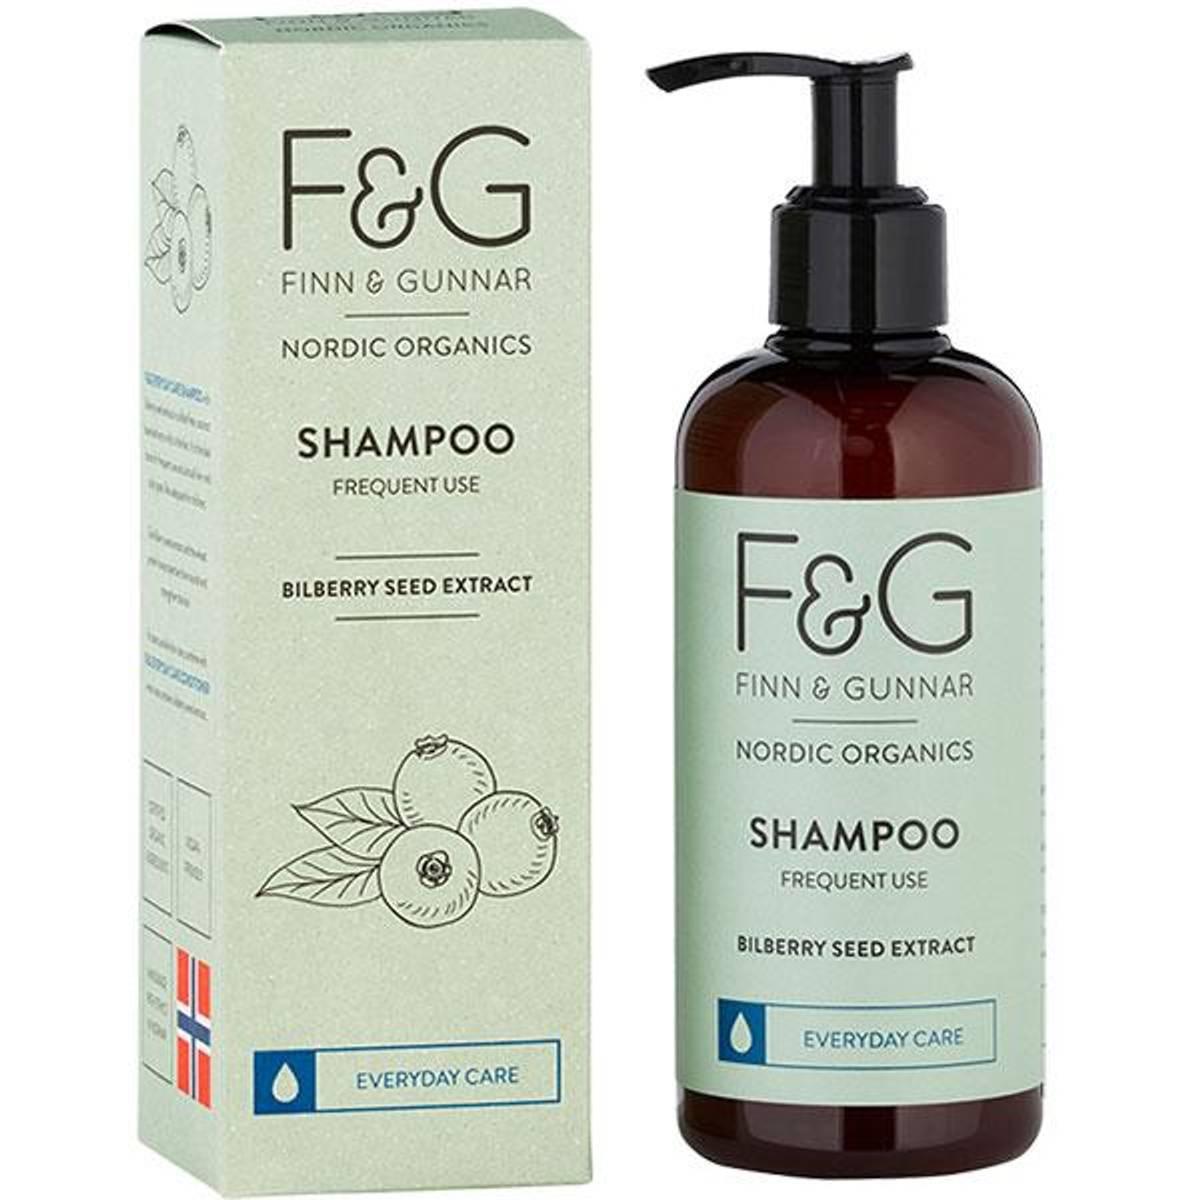 F&G Nordic Organics Shampoo Frequent Use 250 ml